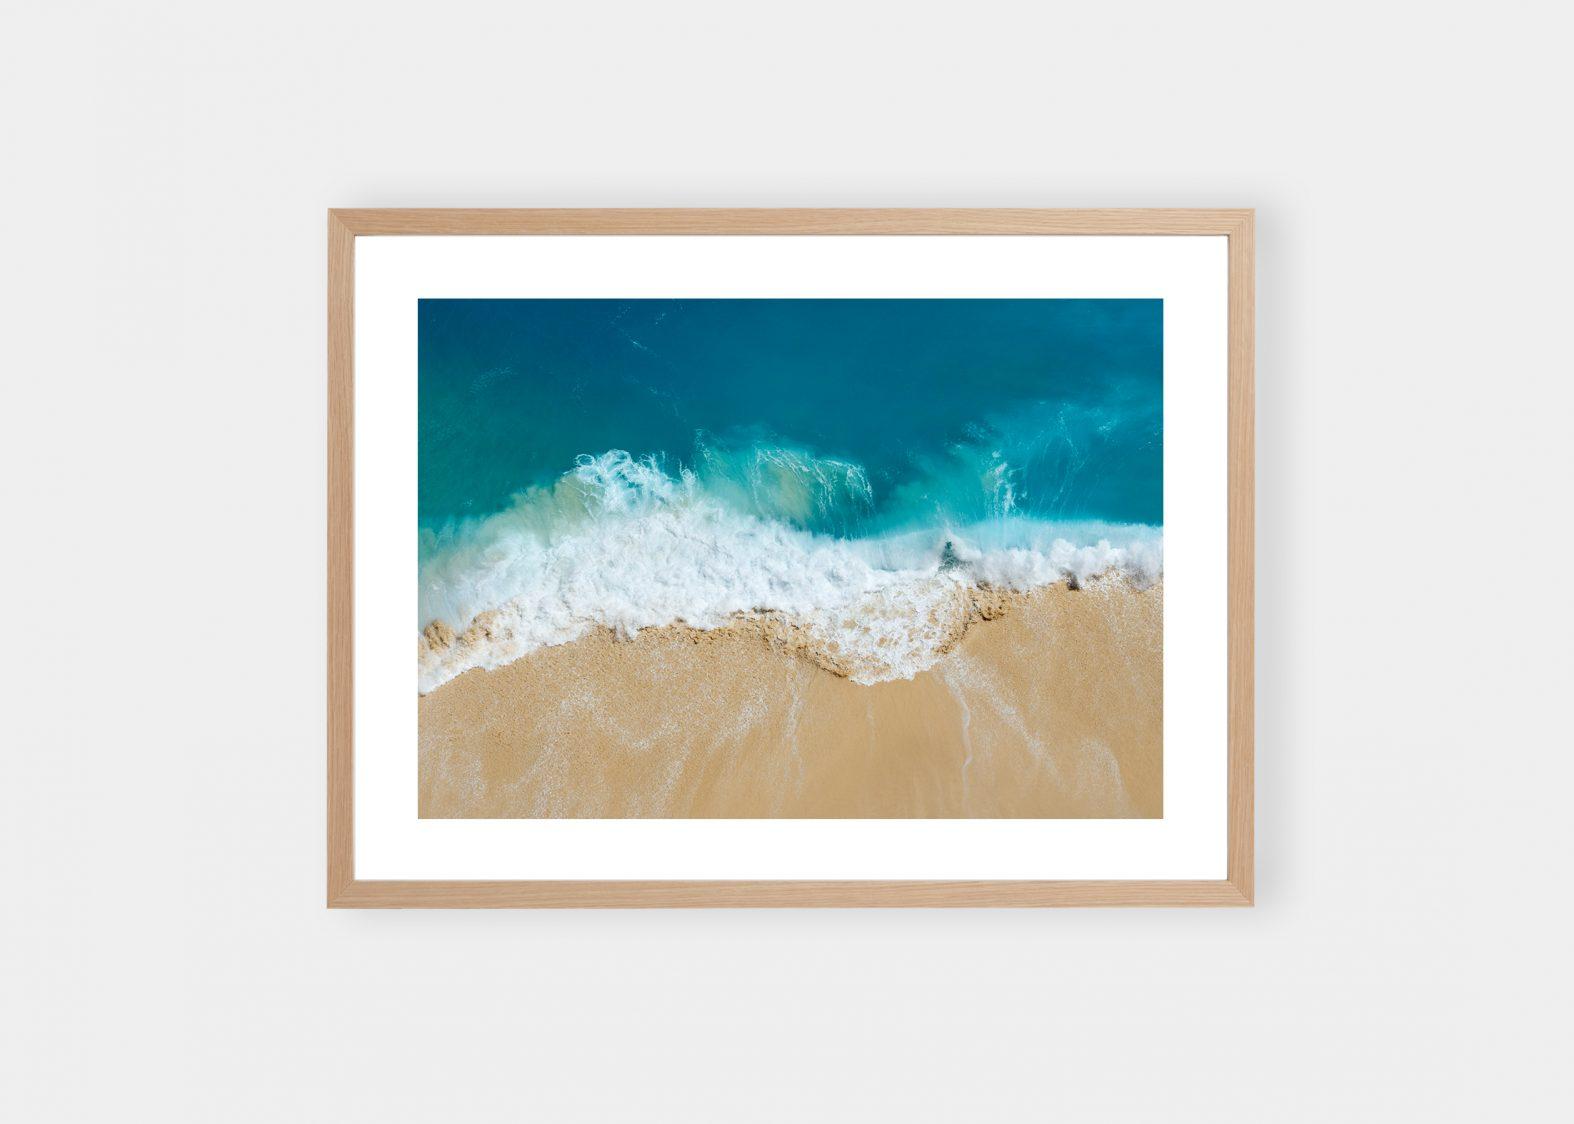 Nusa Penida | Fine Art Landskapsfotografi print til salgs | Stian Gregersen